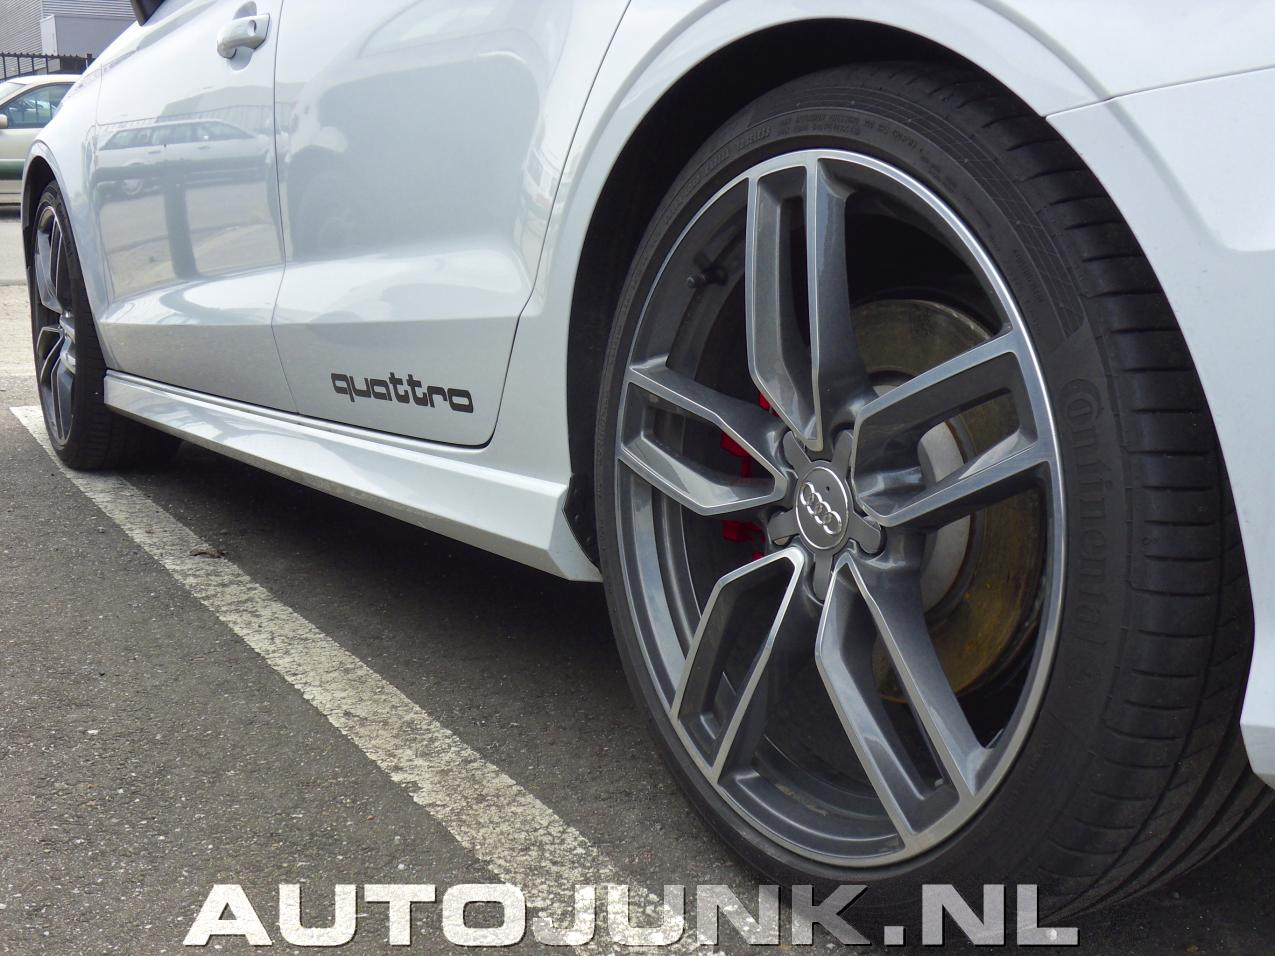 Audi S3 Limousine JD engineering foto's » Autojunk.nl (137281)  Jd